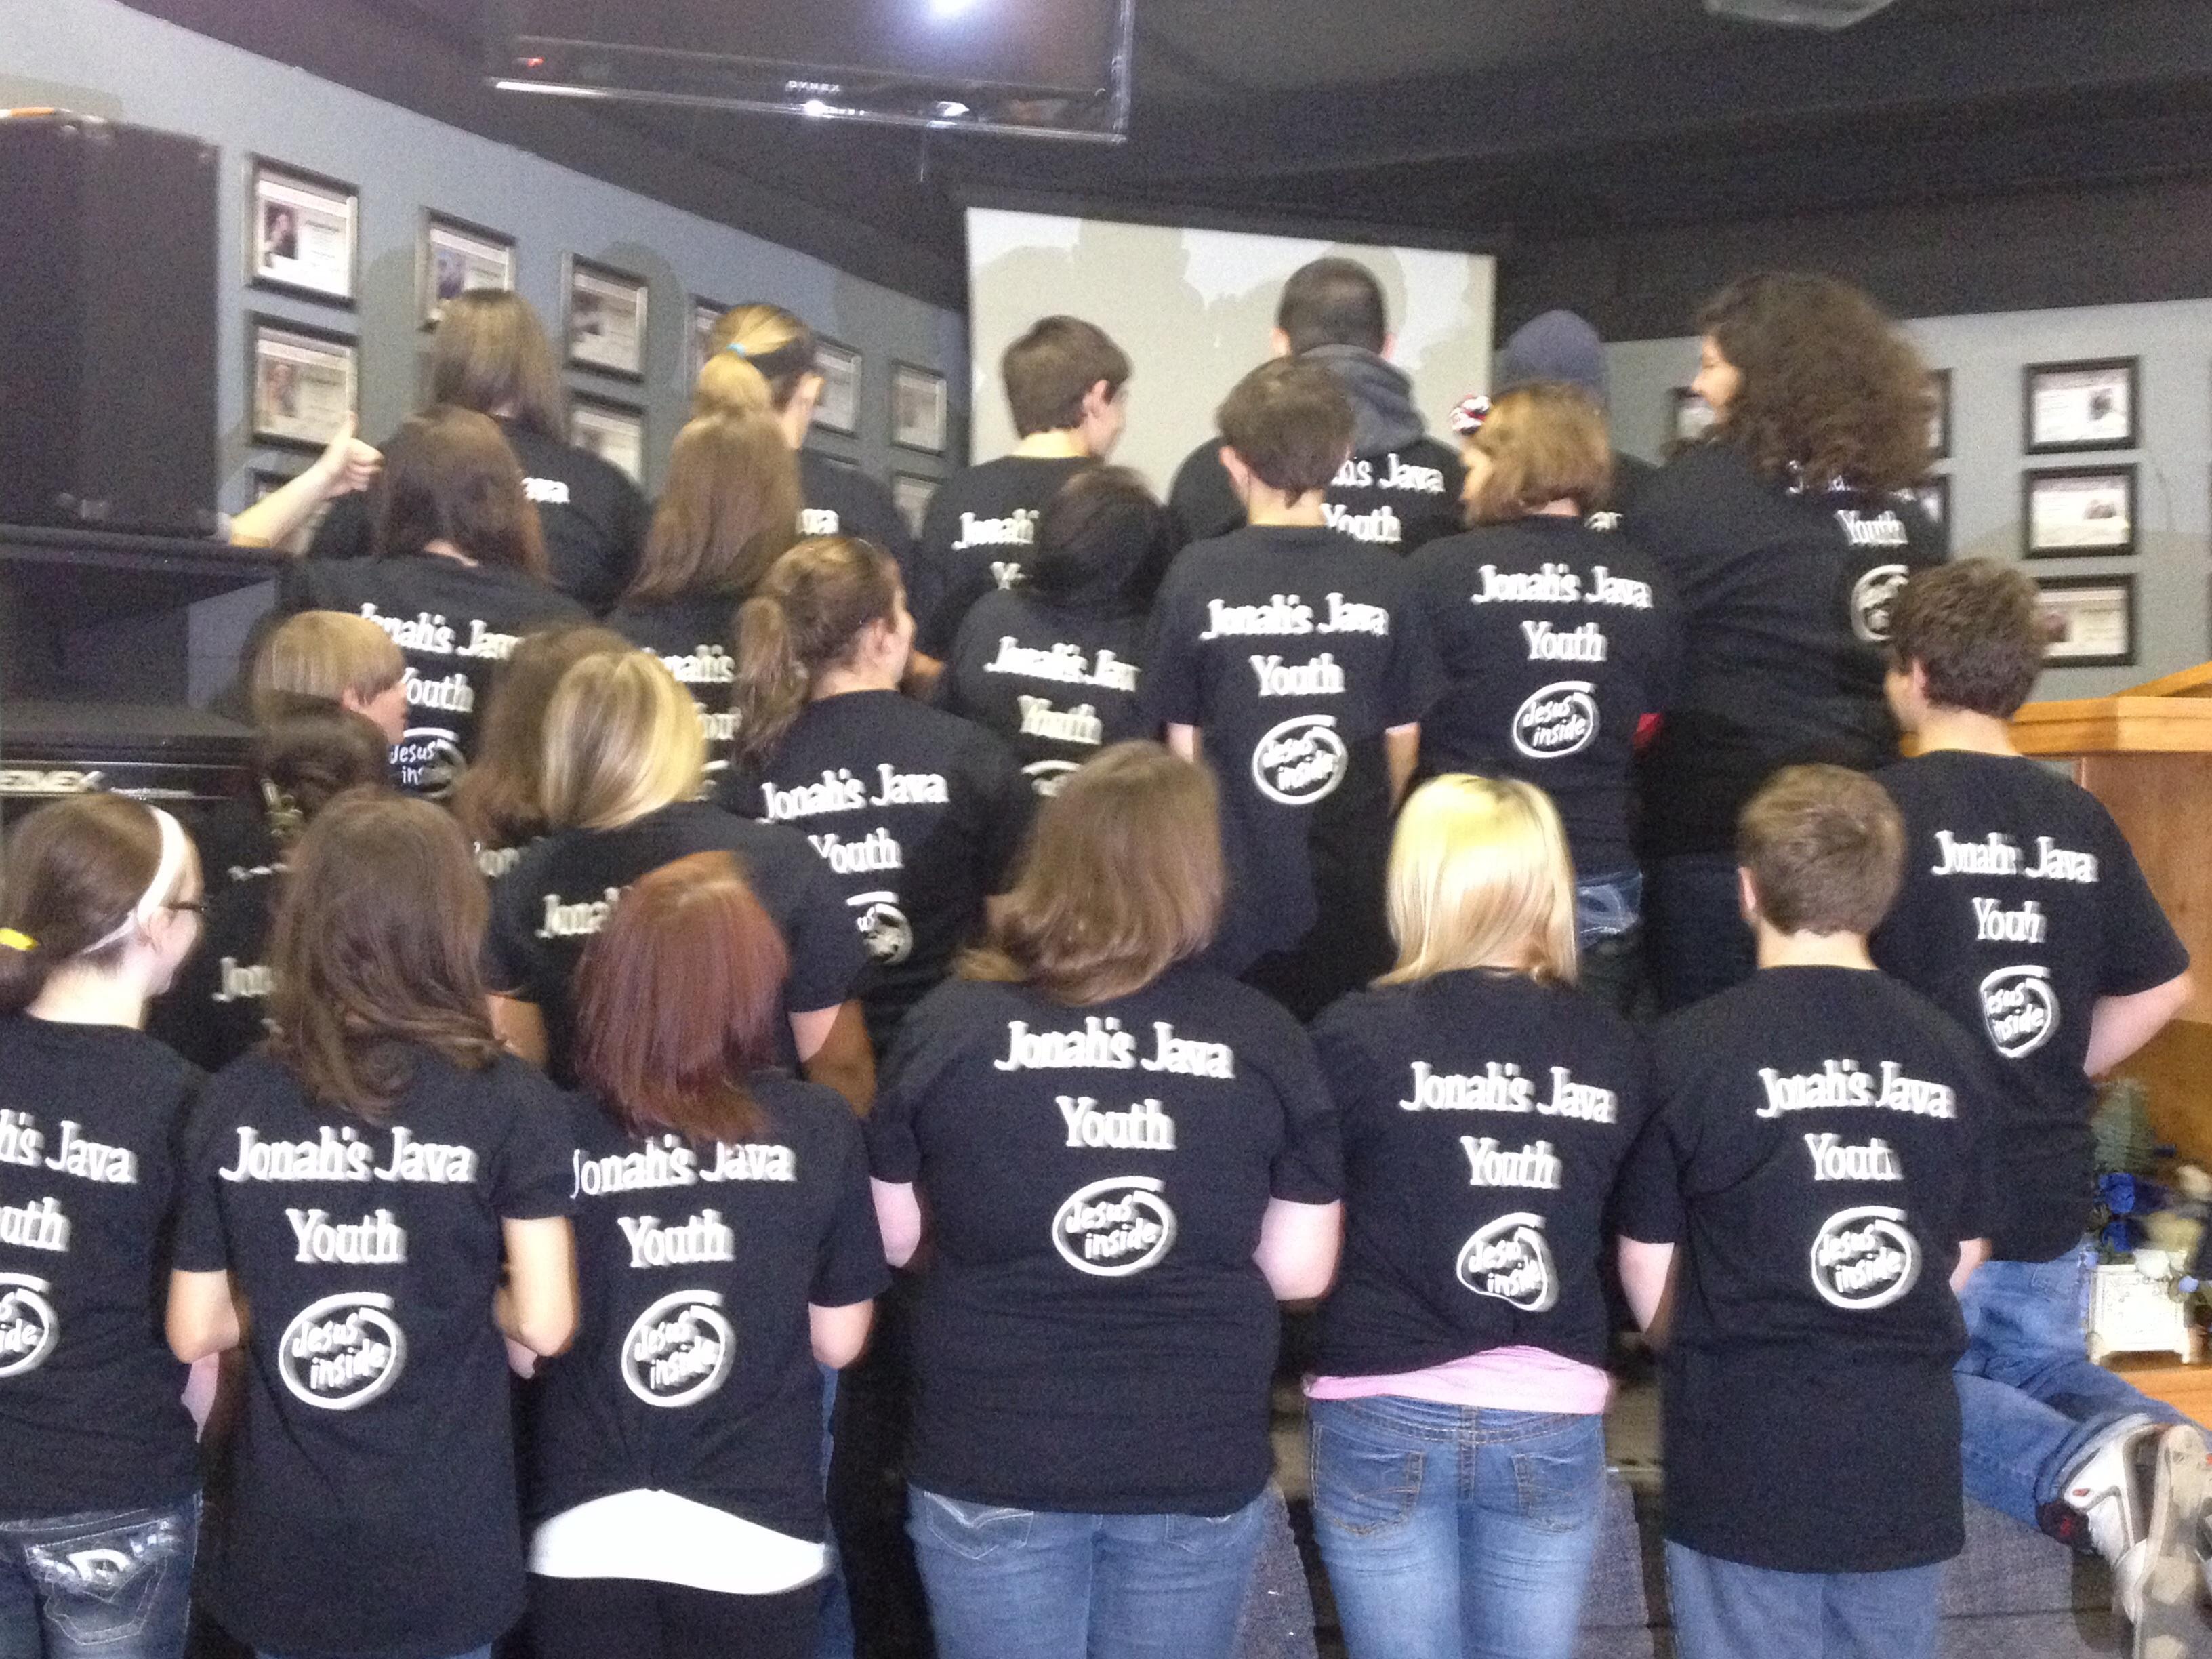 T shirt design youth - Jonah S Java Youth Group T Shirt Photo